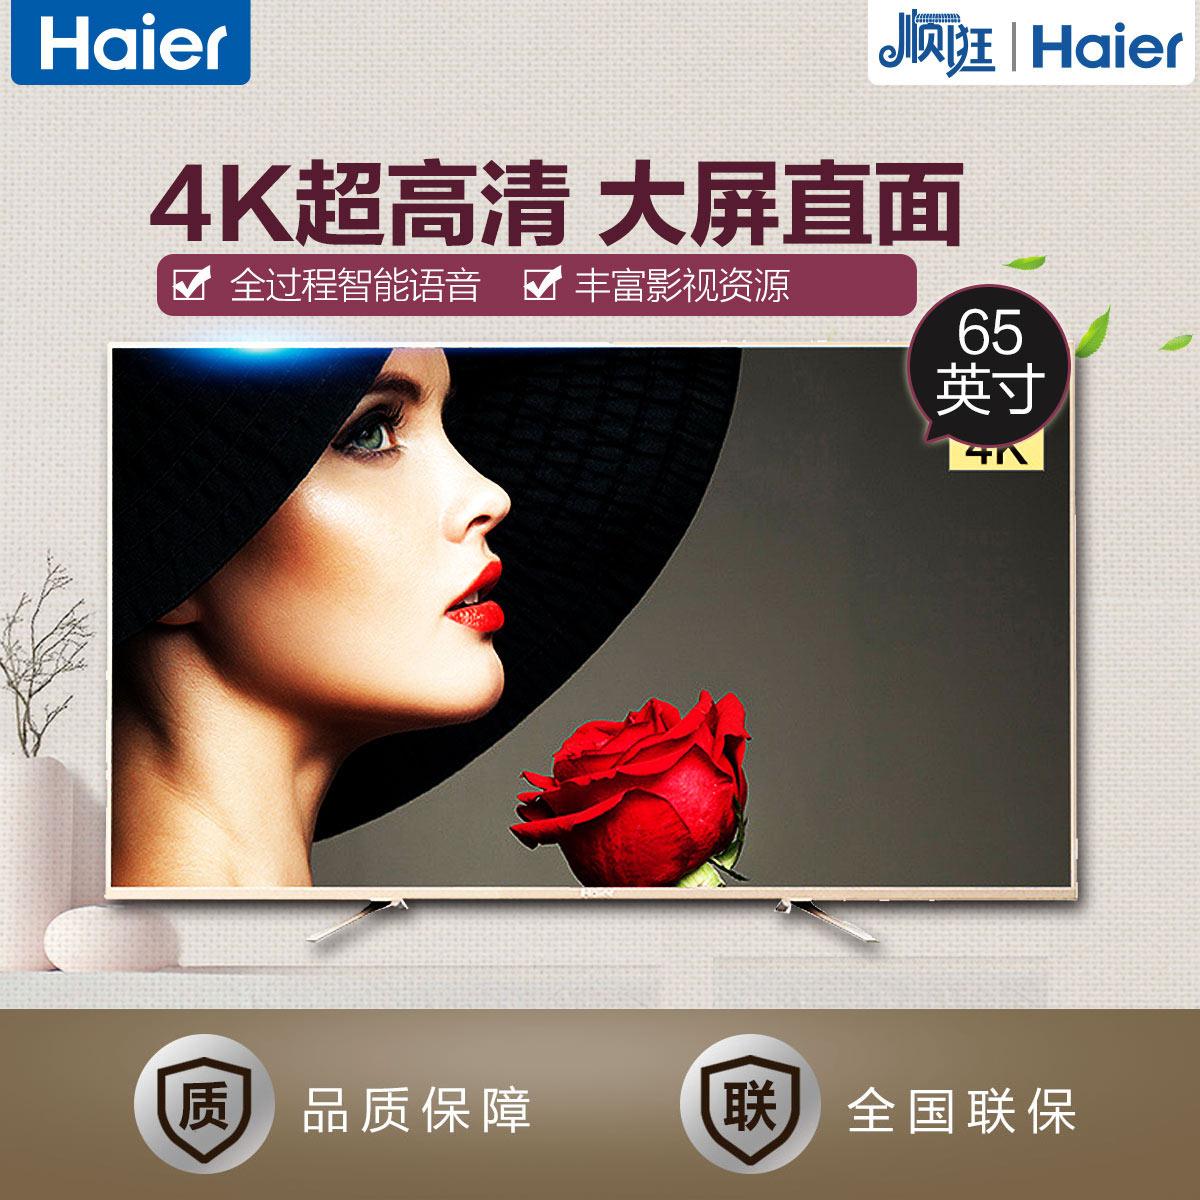 Haier/海尔             4K电视             LS65A51G